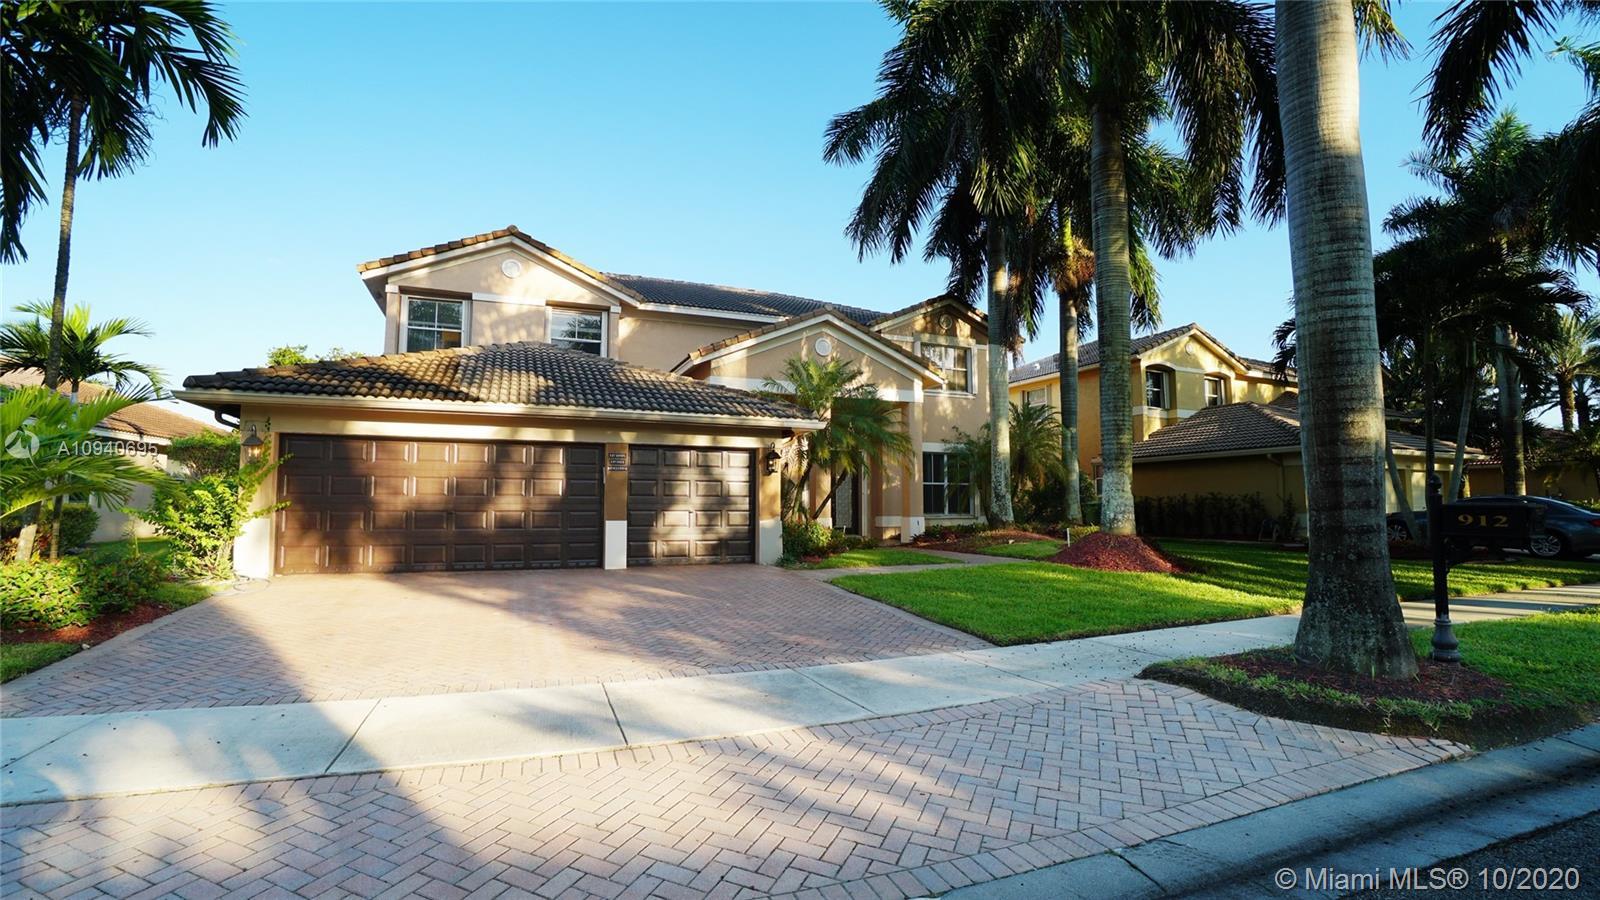 912 Windward Way Luxury Real Estate